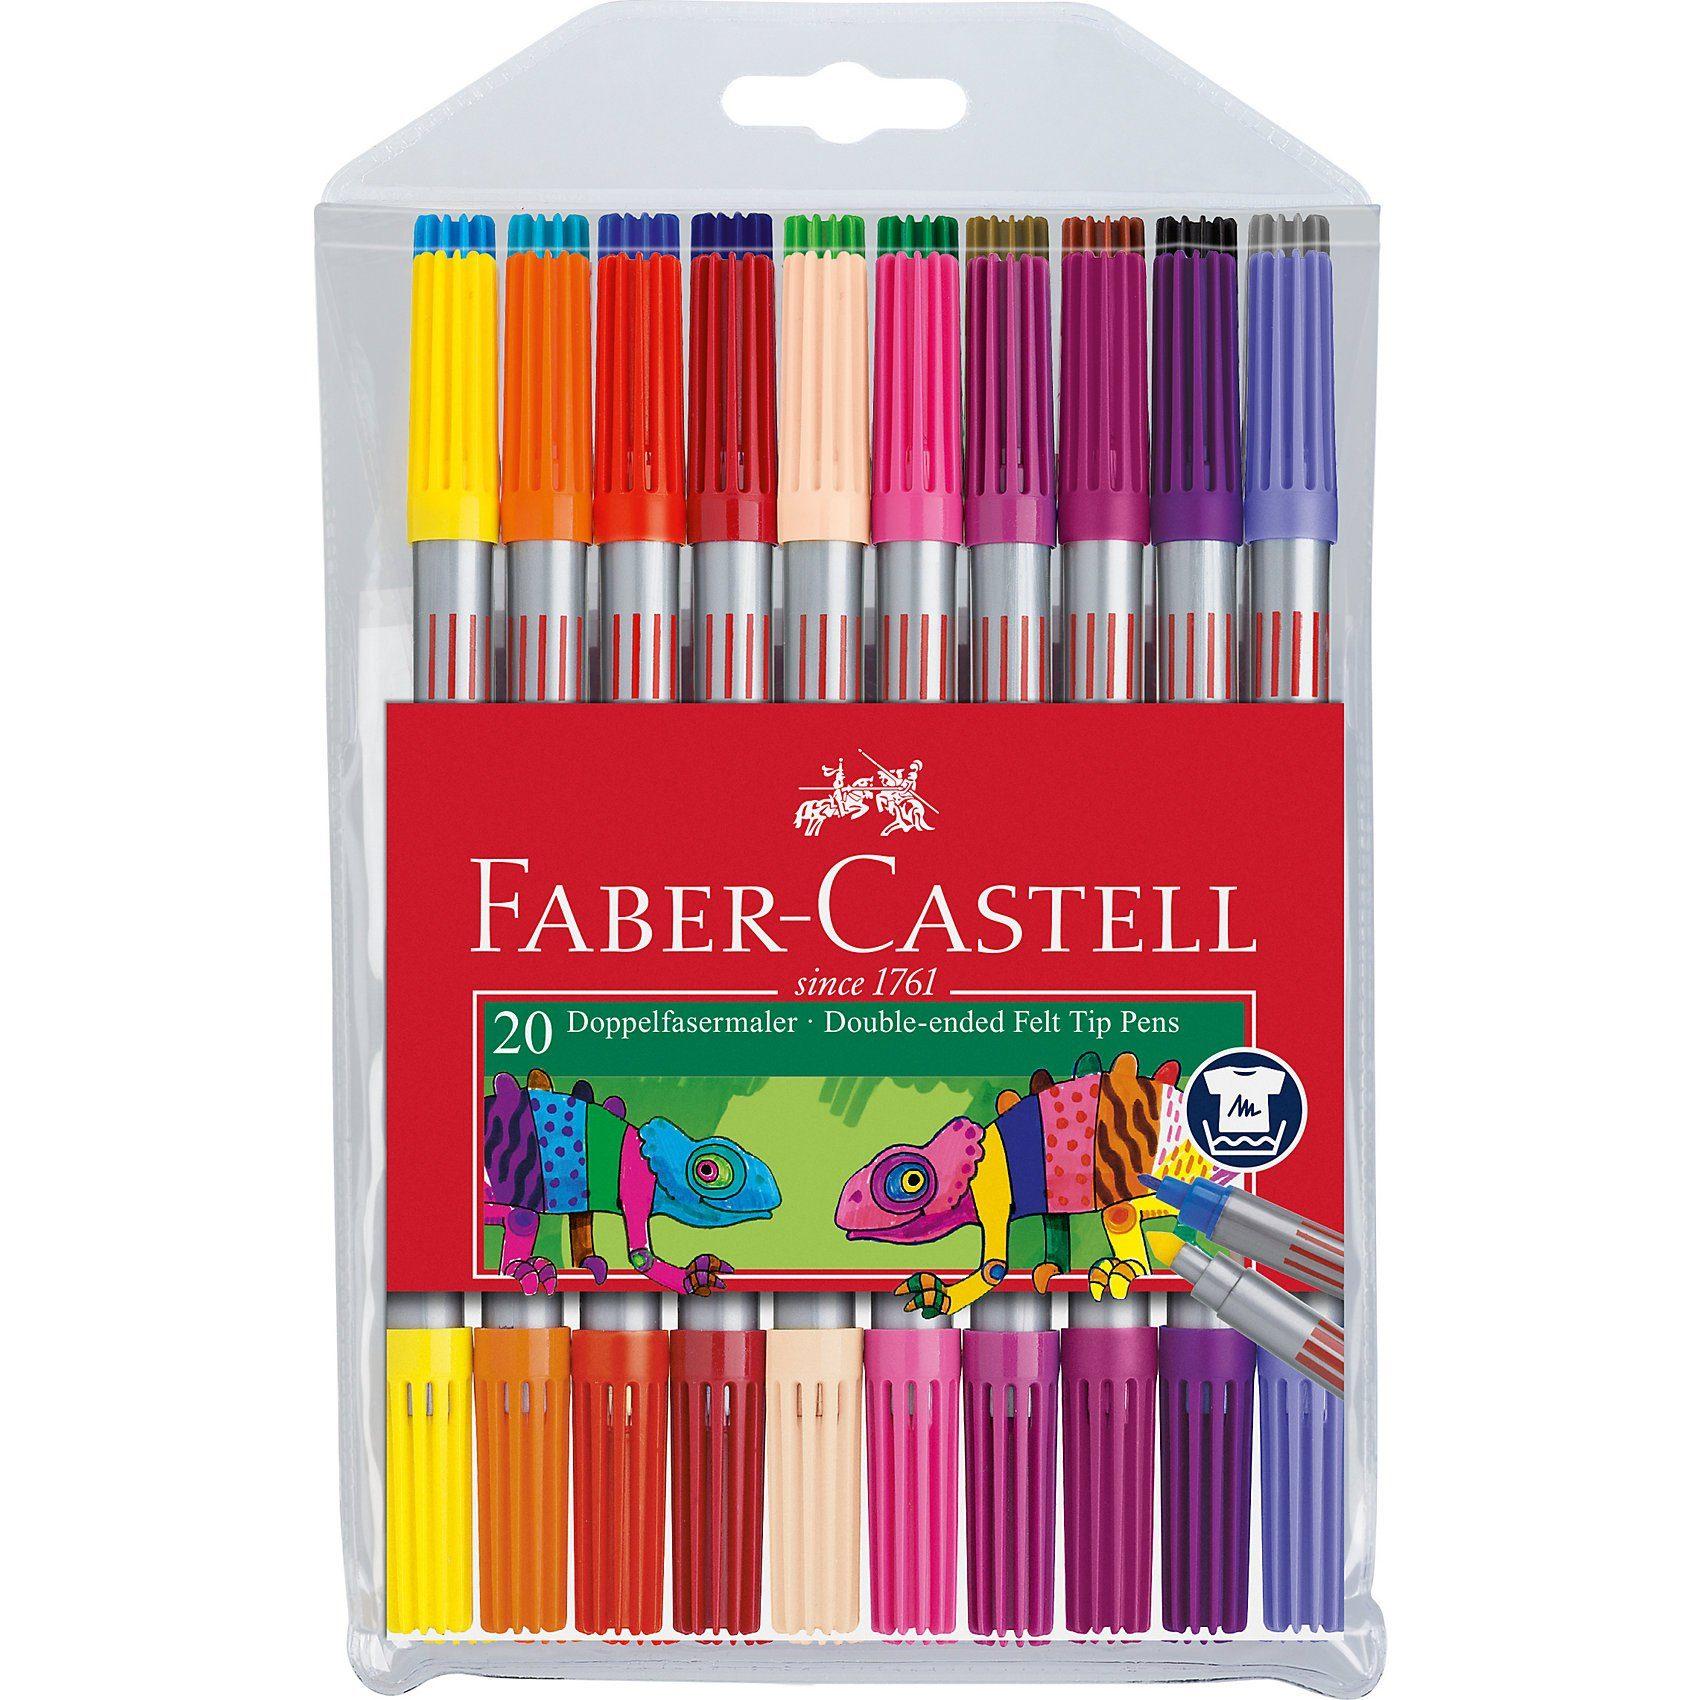 Faber-Castell Doppelfilzstifte, 20 Farben